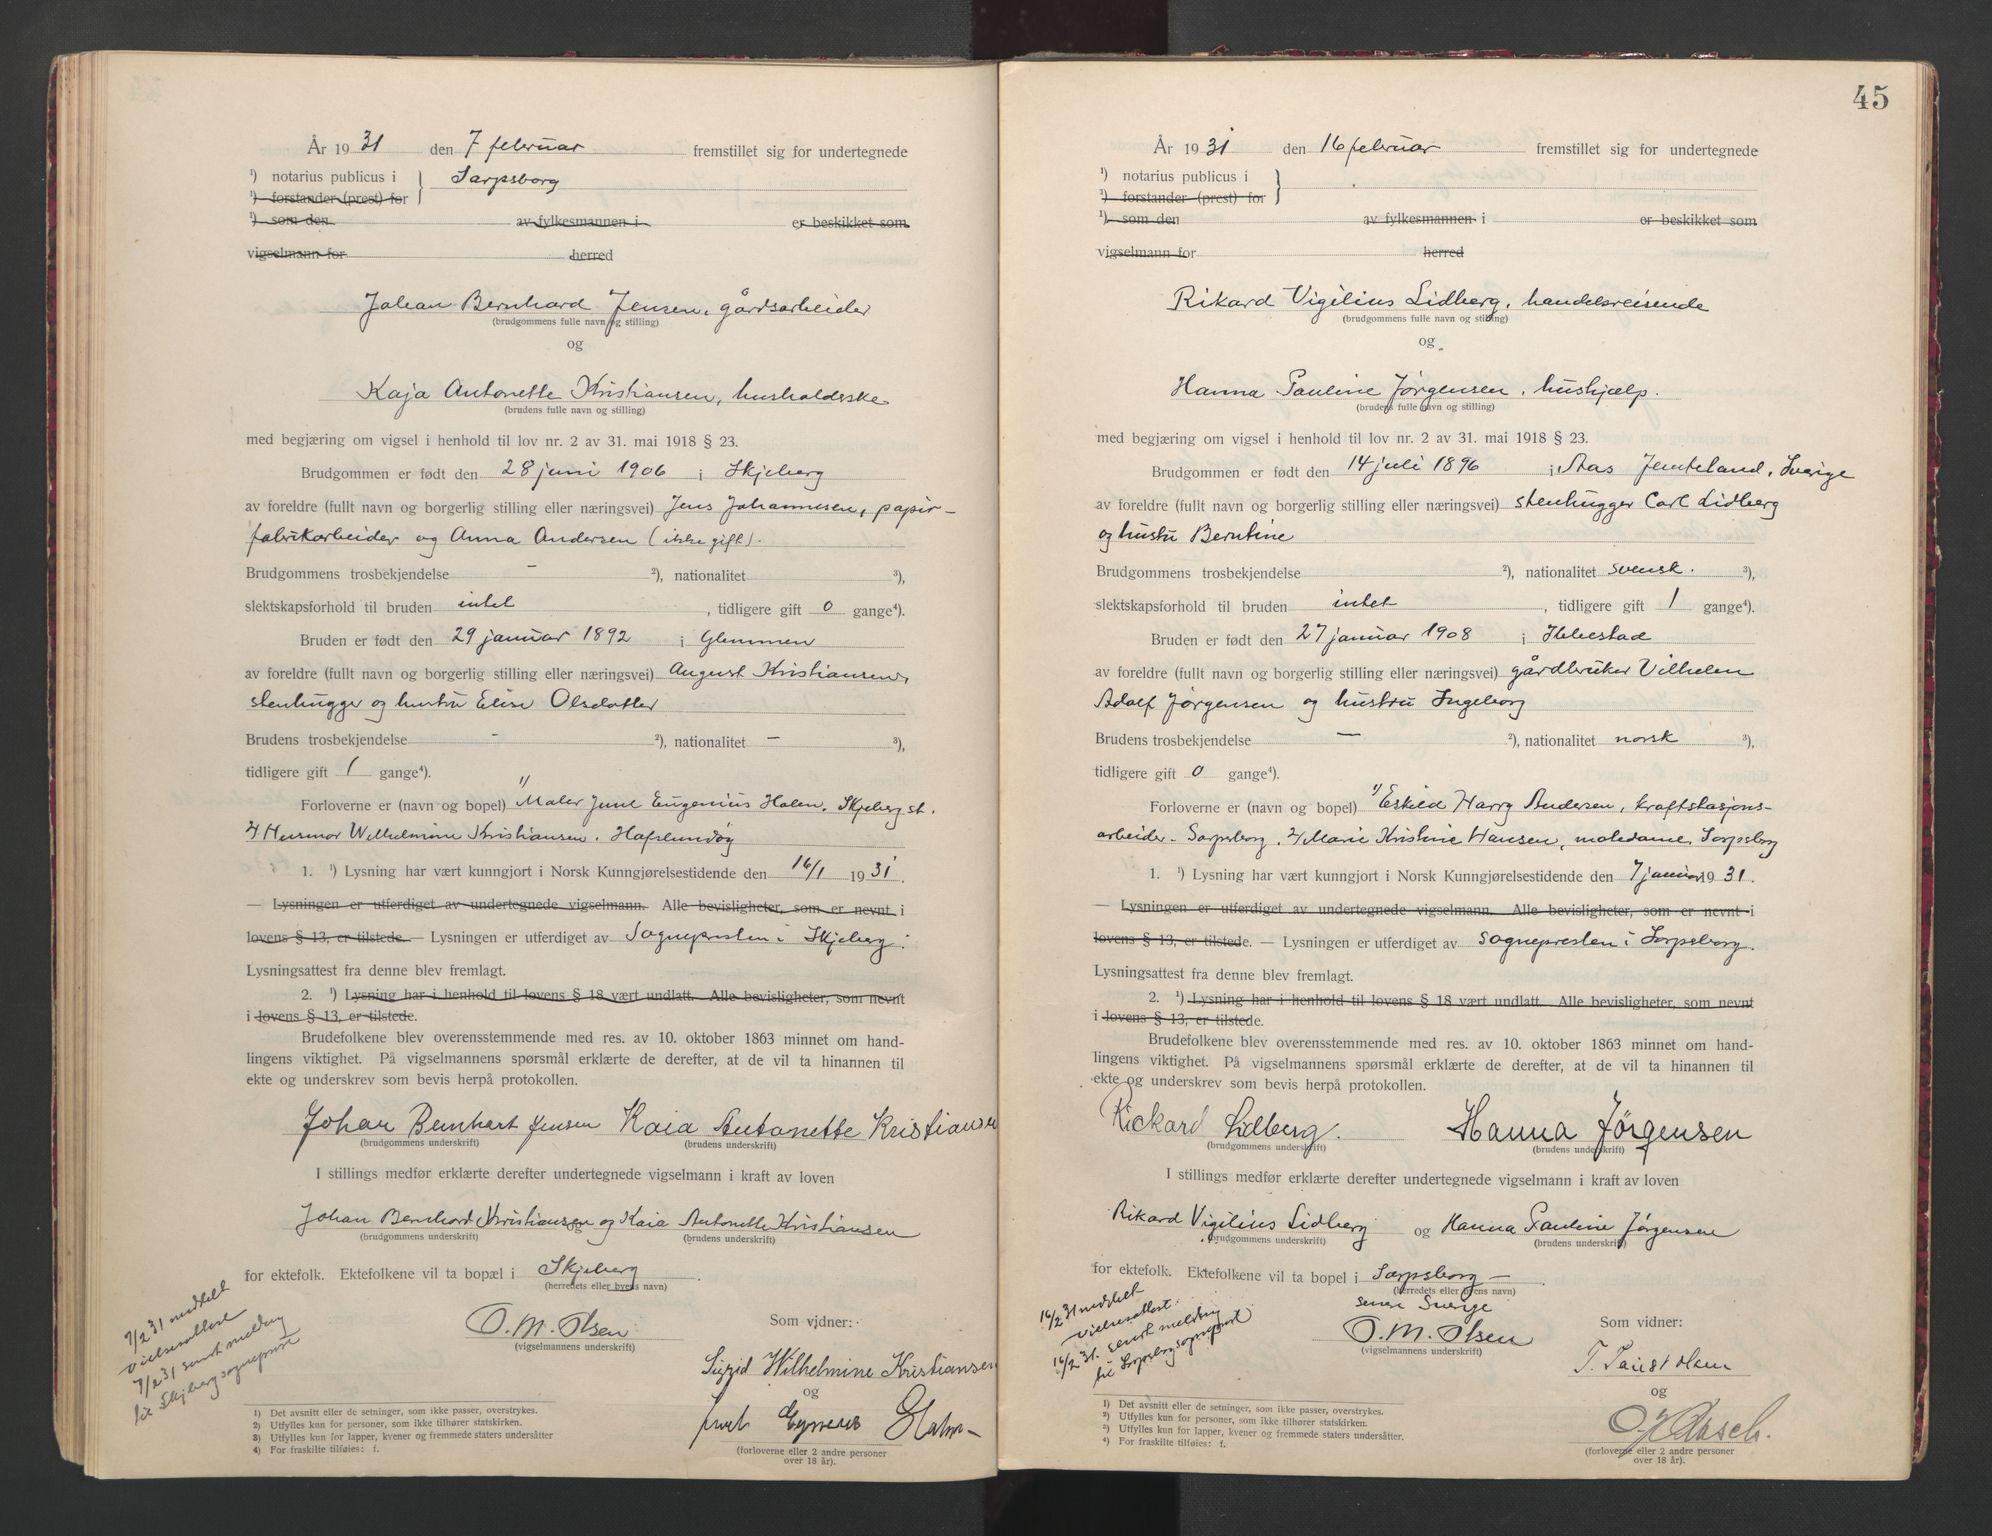 SAO, Sarpsborg byfogd, L/Lb/Lba/L0001: Vigselbok, 1920-1941, s. 45